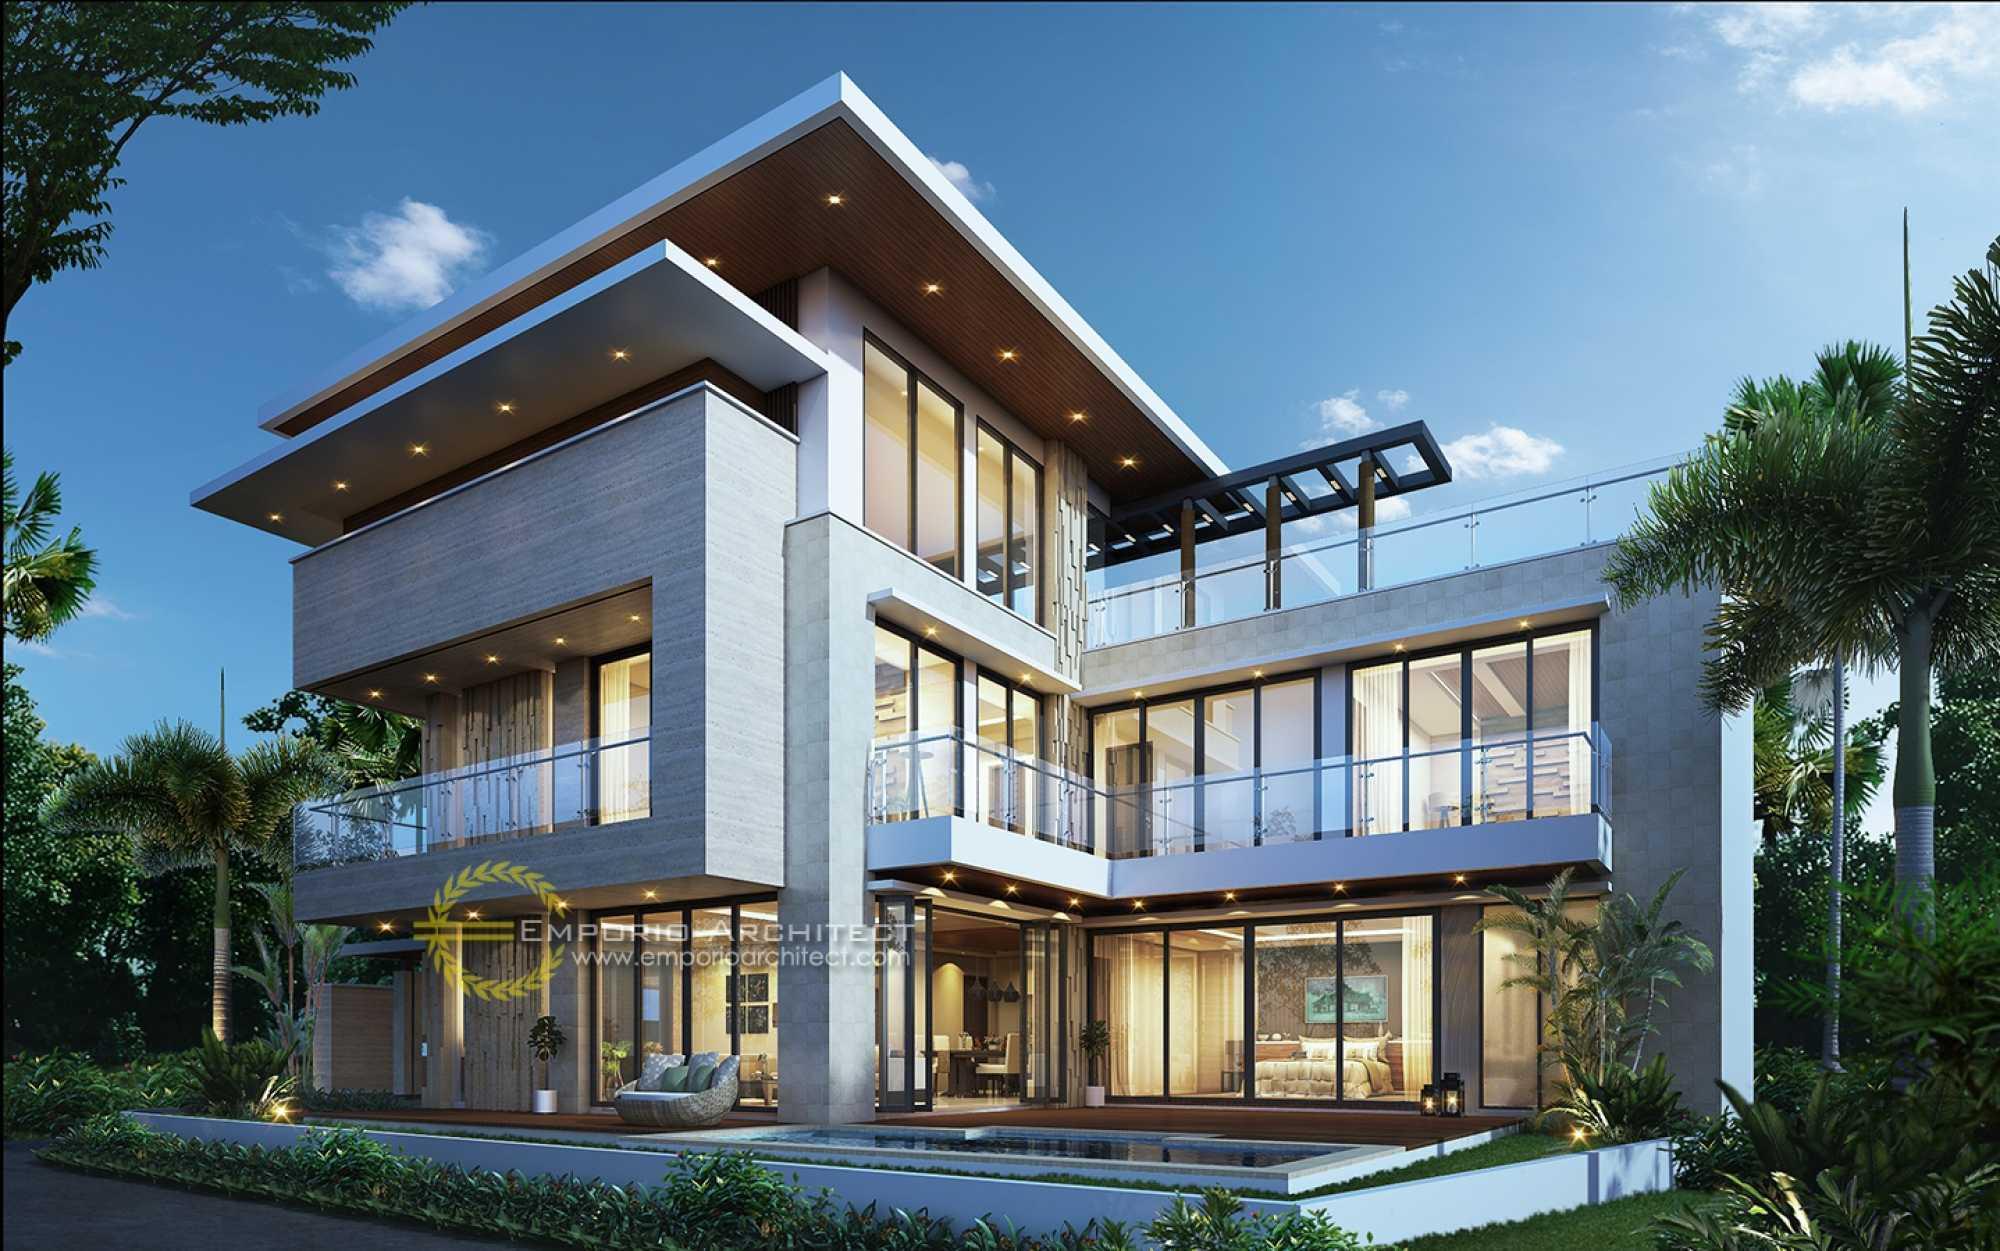 Emporio Architect Jasa Arsitek Makassar Desain Rumah Modern Tropis 235 @ Makassar Makassar, Kota Makassar, Sulawesi Selatan, Indonesia Makassar, Kota Makassar, Sulawesi Selatan, Indonesia Emporio-Architect-Jasa-Arsitek-Makassar-Desain-Rumah-Modern-Tropis-235-Makassar   79232